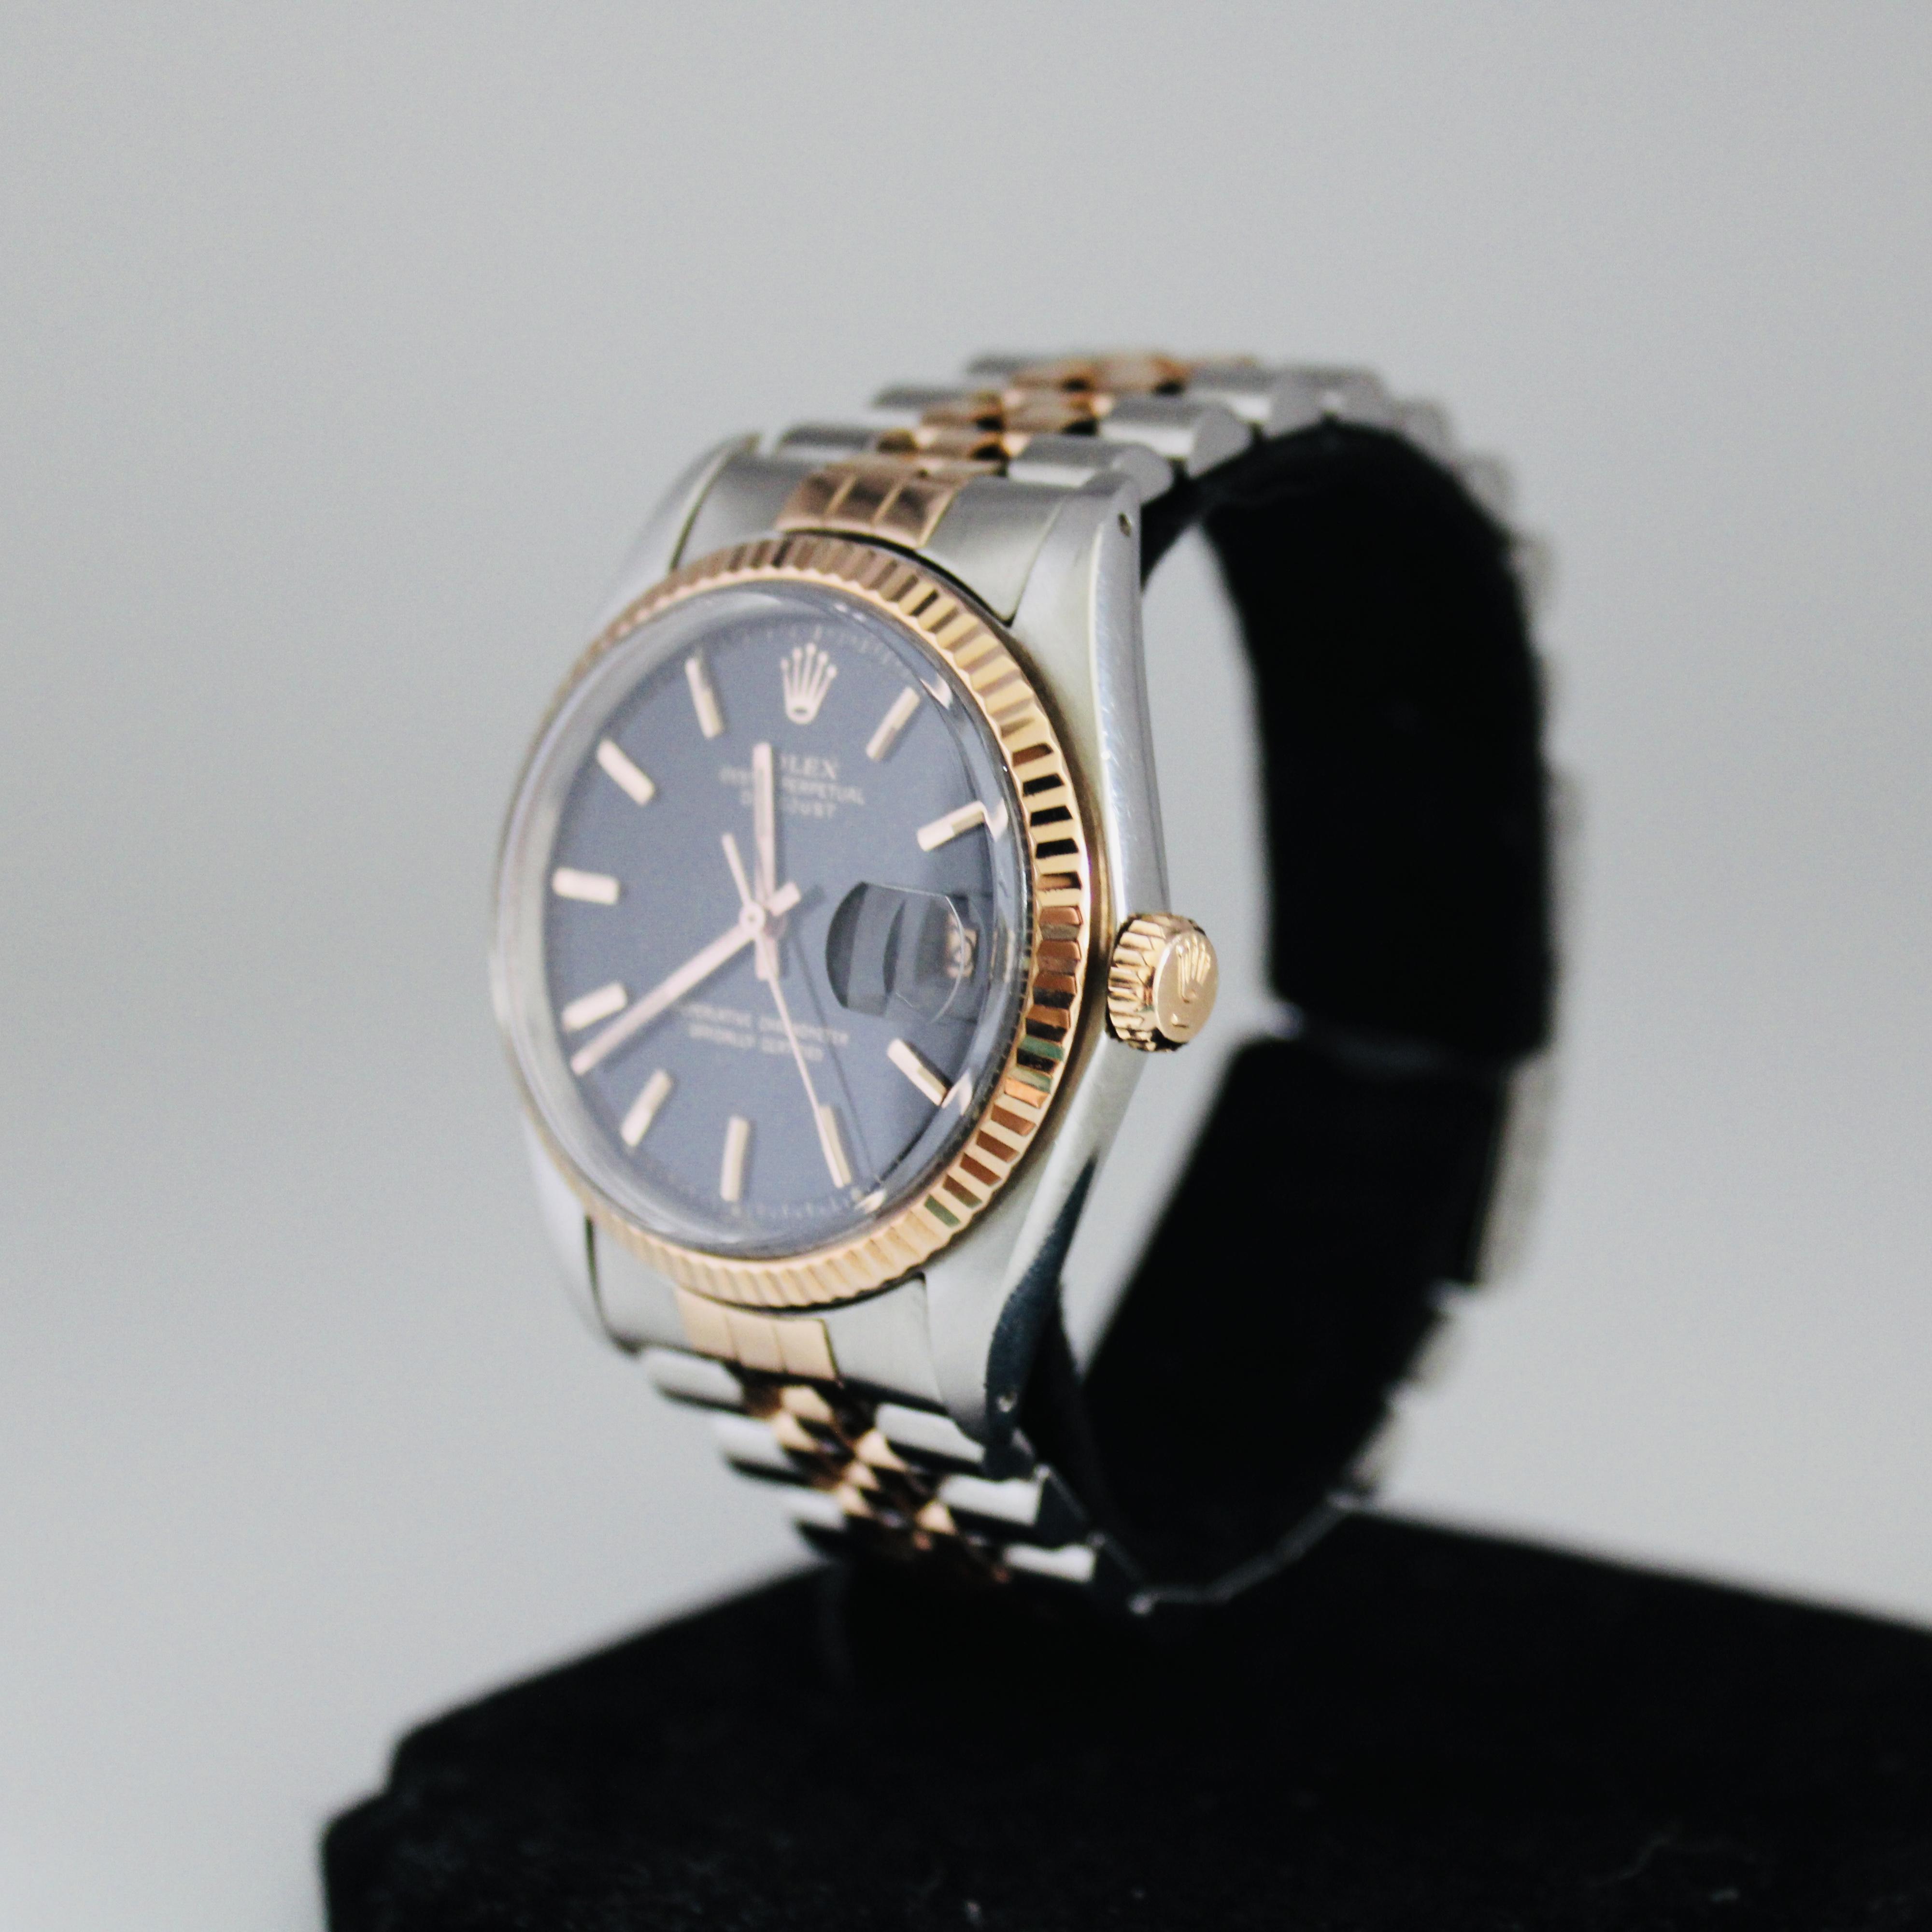 Rolex Datejust ref 1601 Steel & Pink Gold - Image 2 of 8